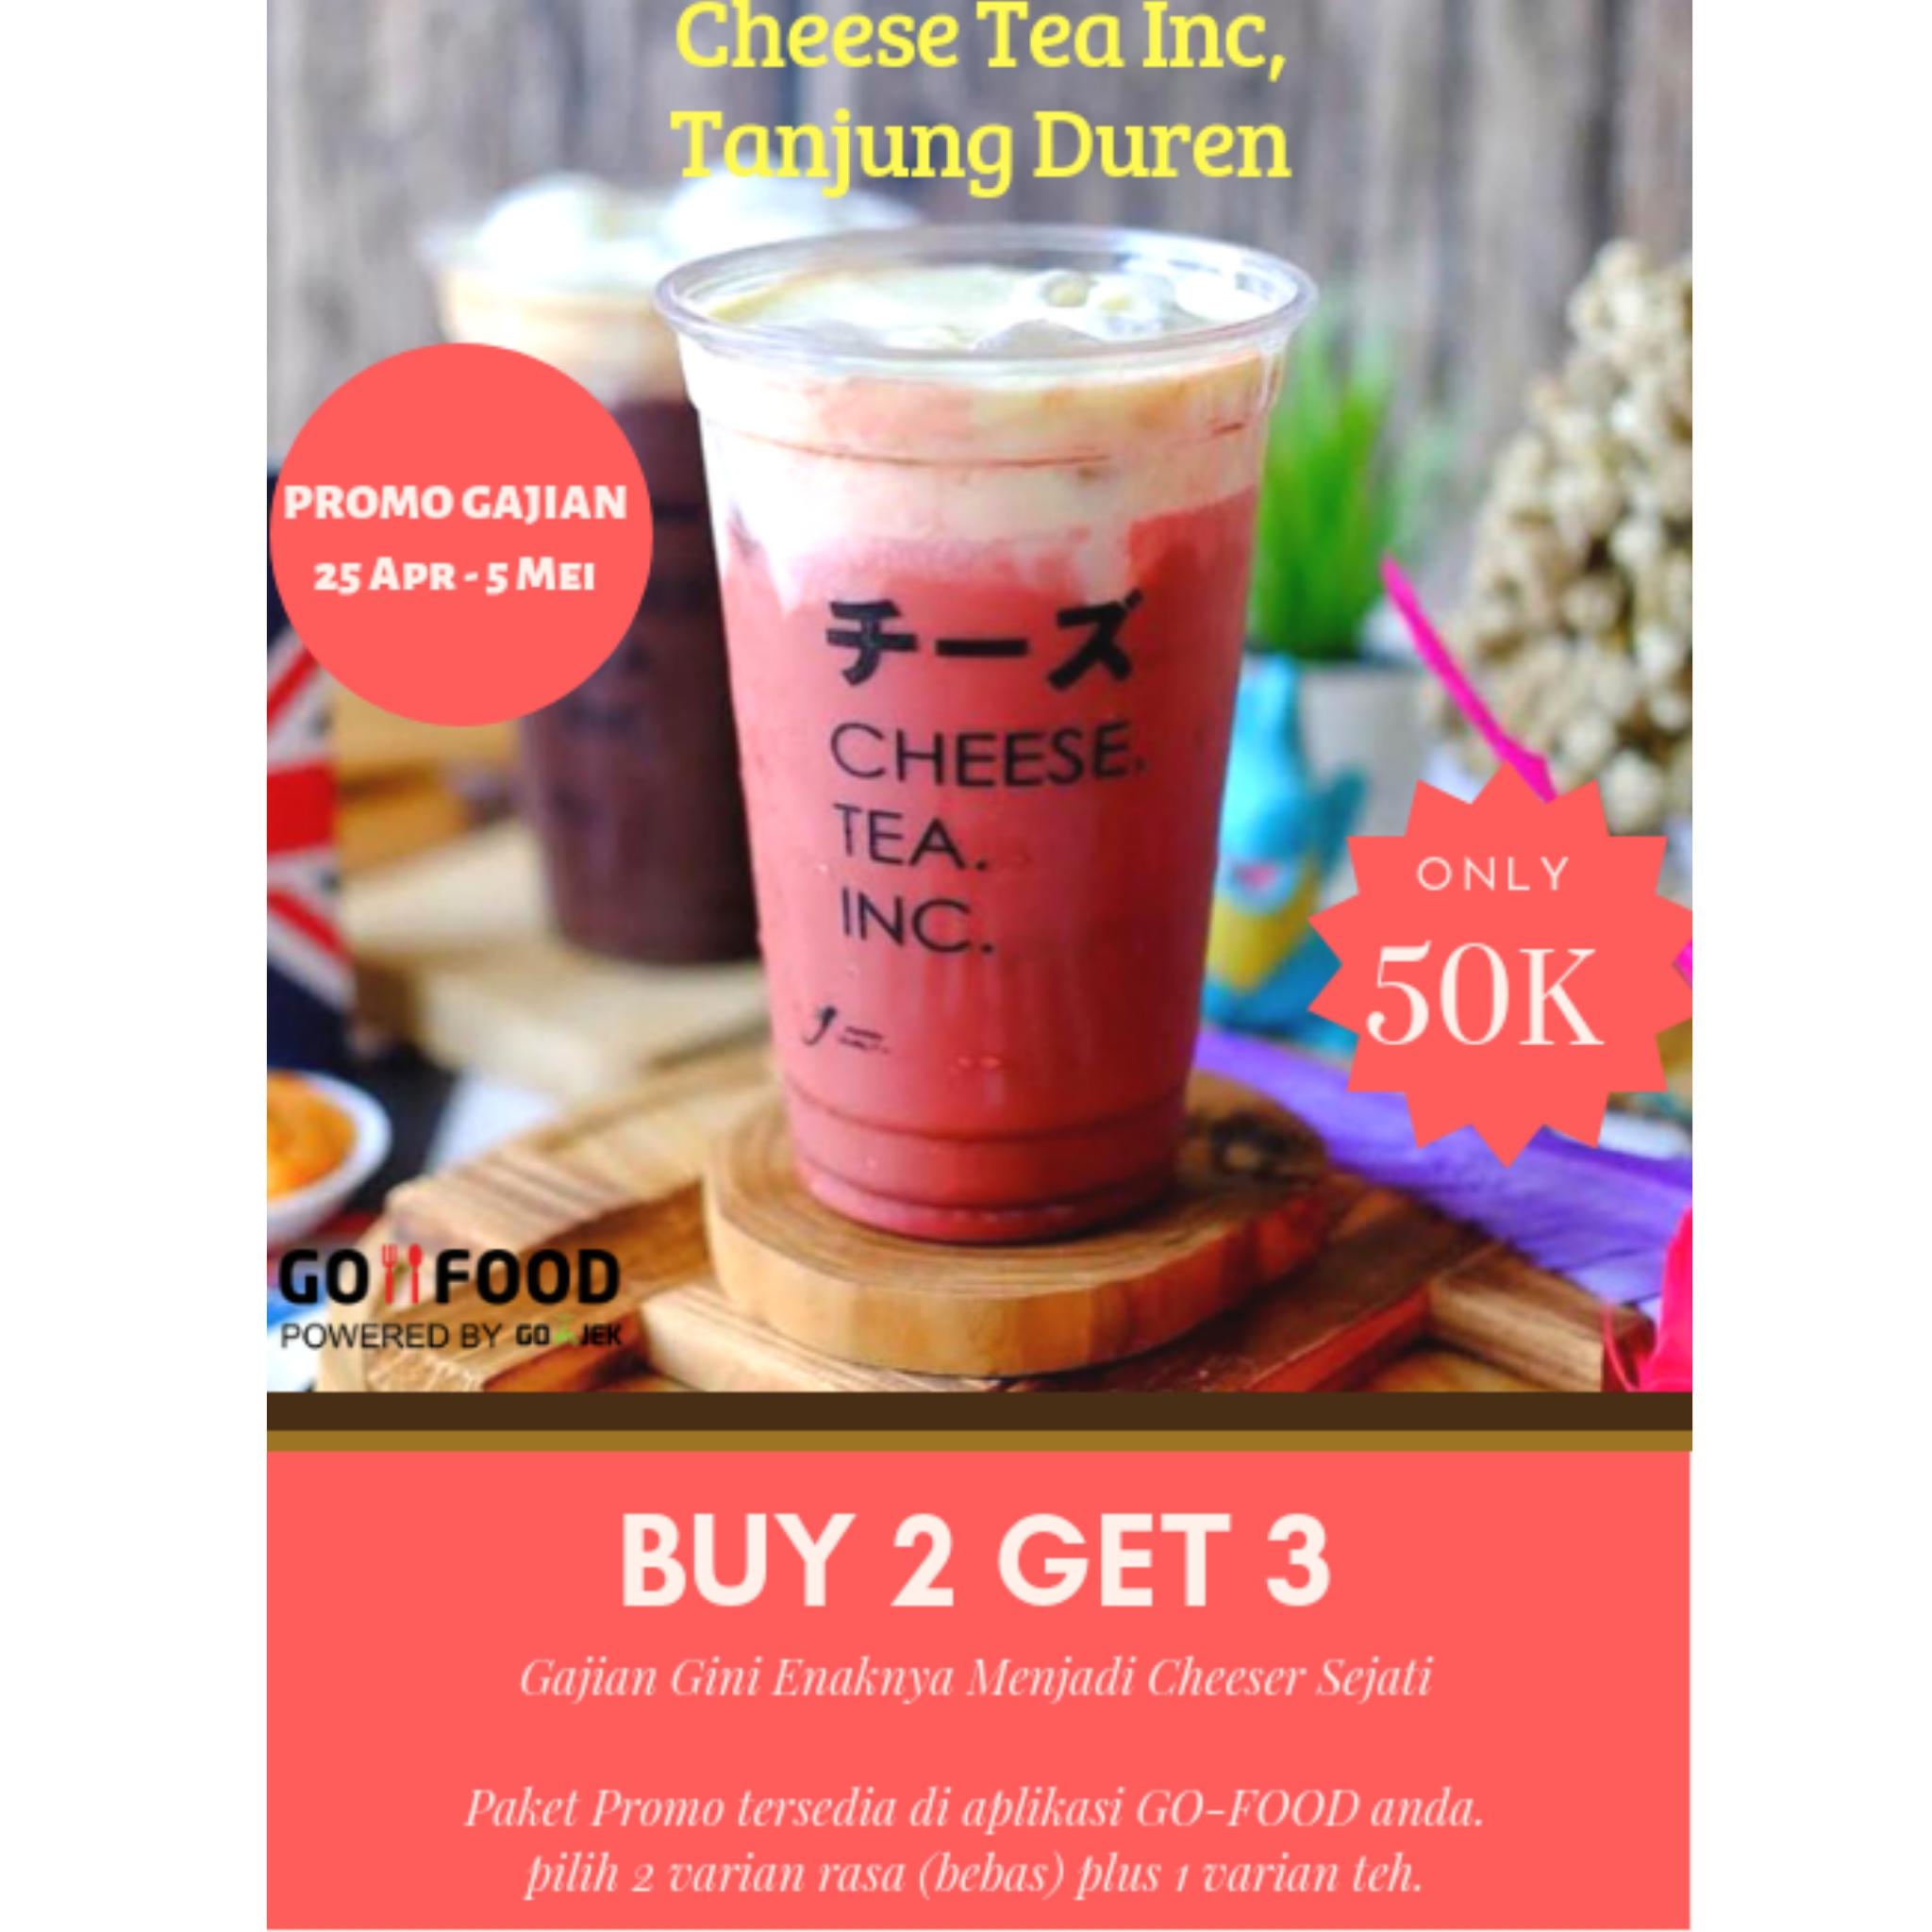 Cheese Tea Inc Tanjung Duren PROMO GAJIAN Cheese Tea, Buy 2 Get 3